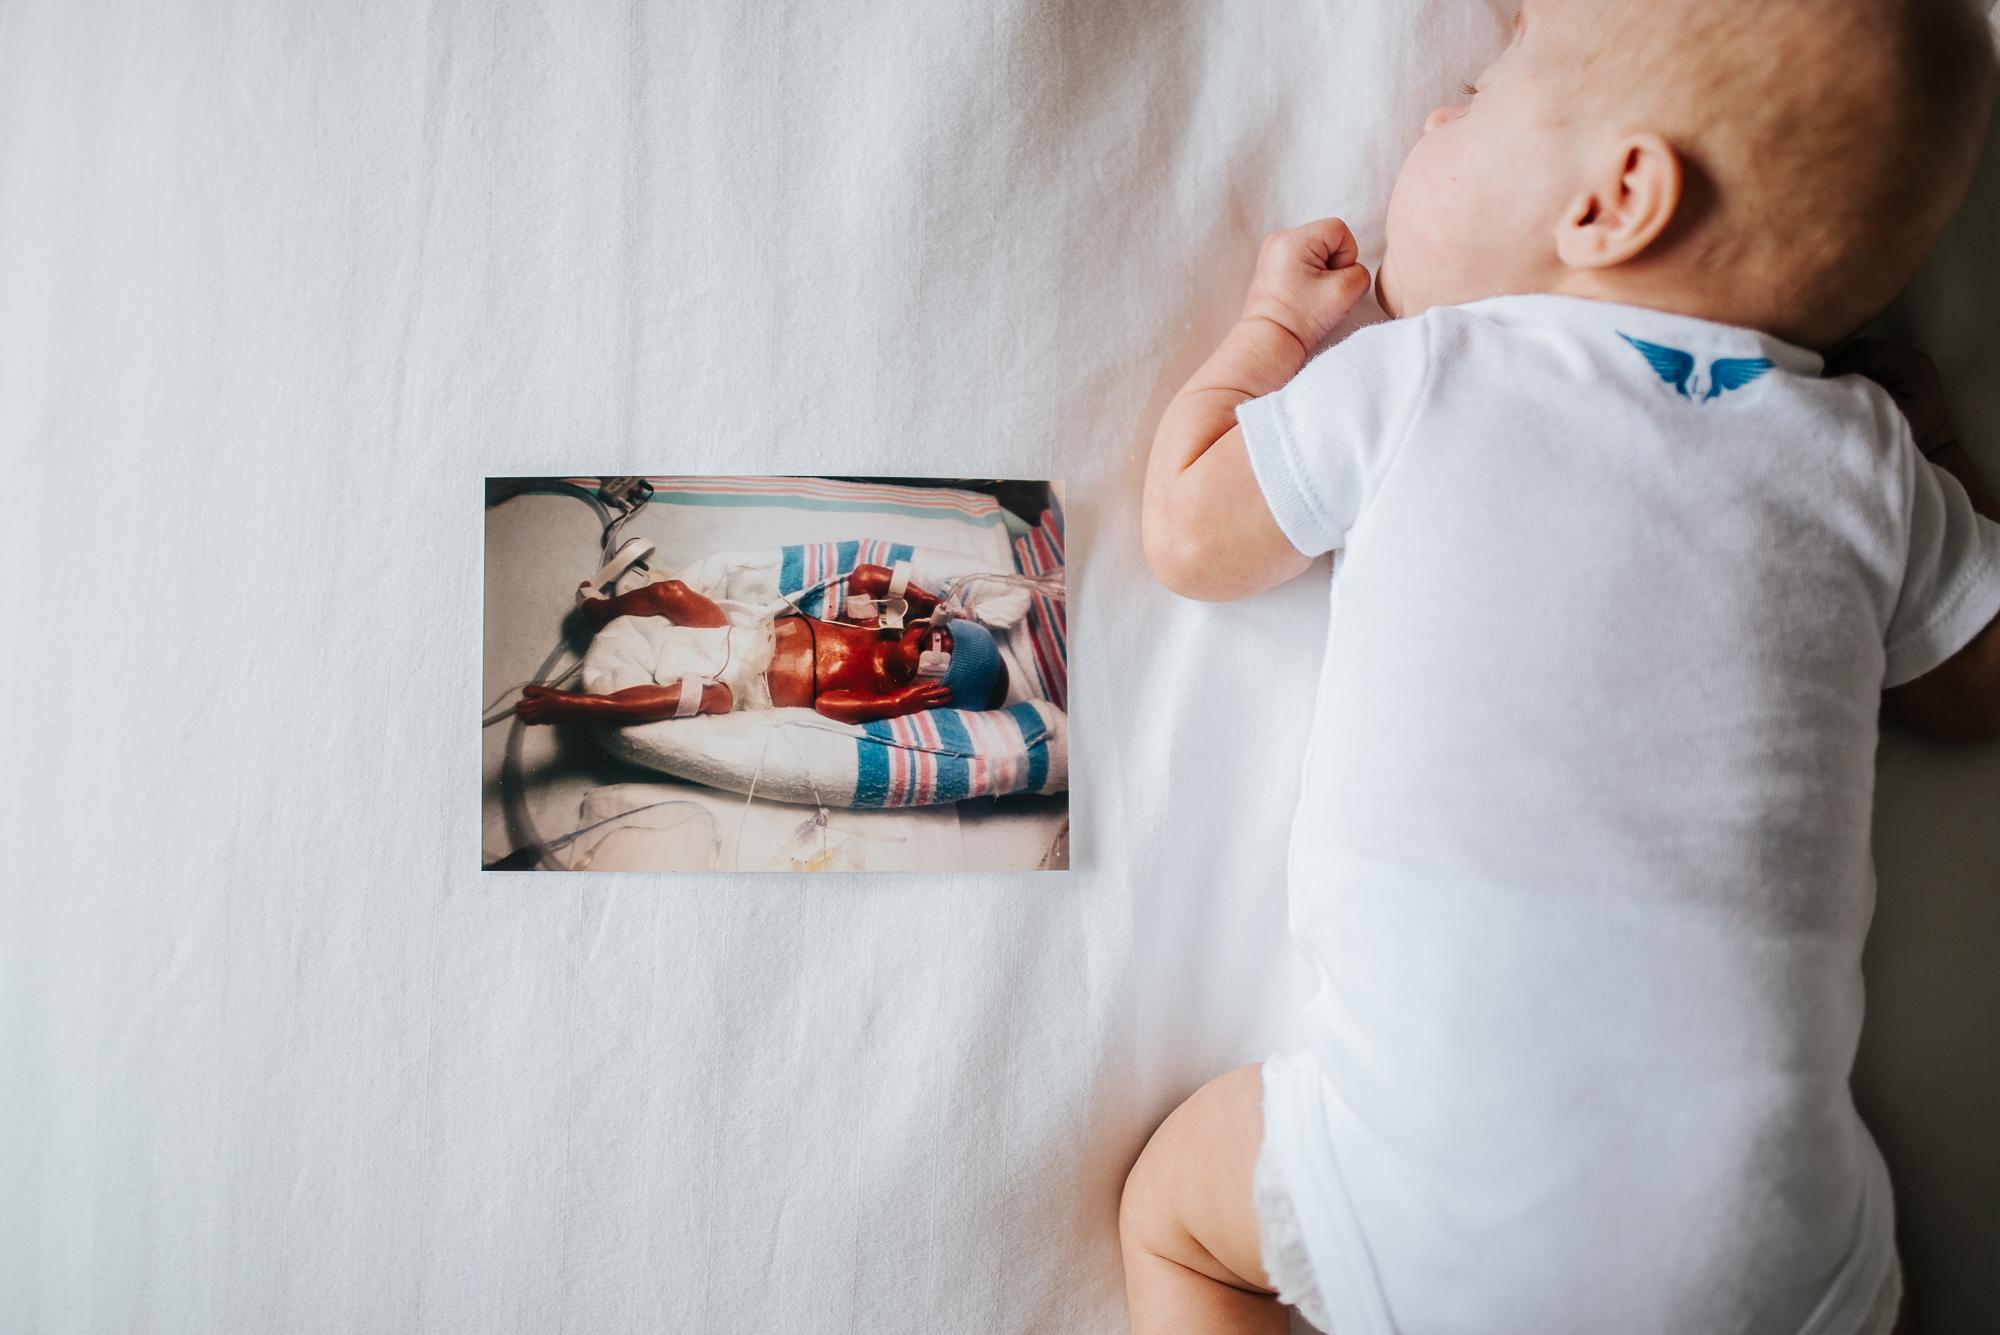 nataliethomasphotography.com-in-home-newborn-session-4727.jpg